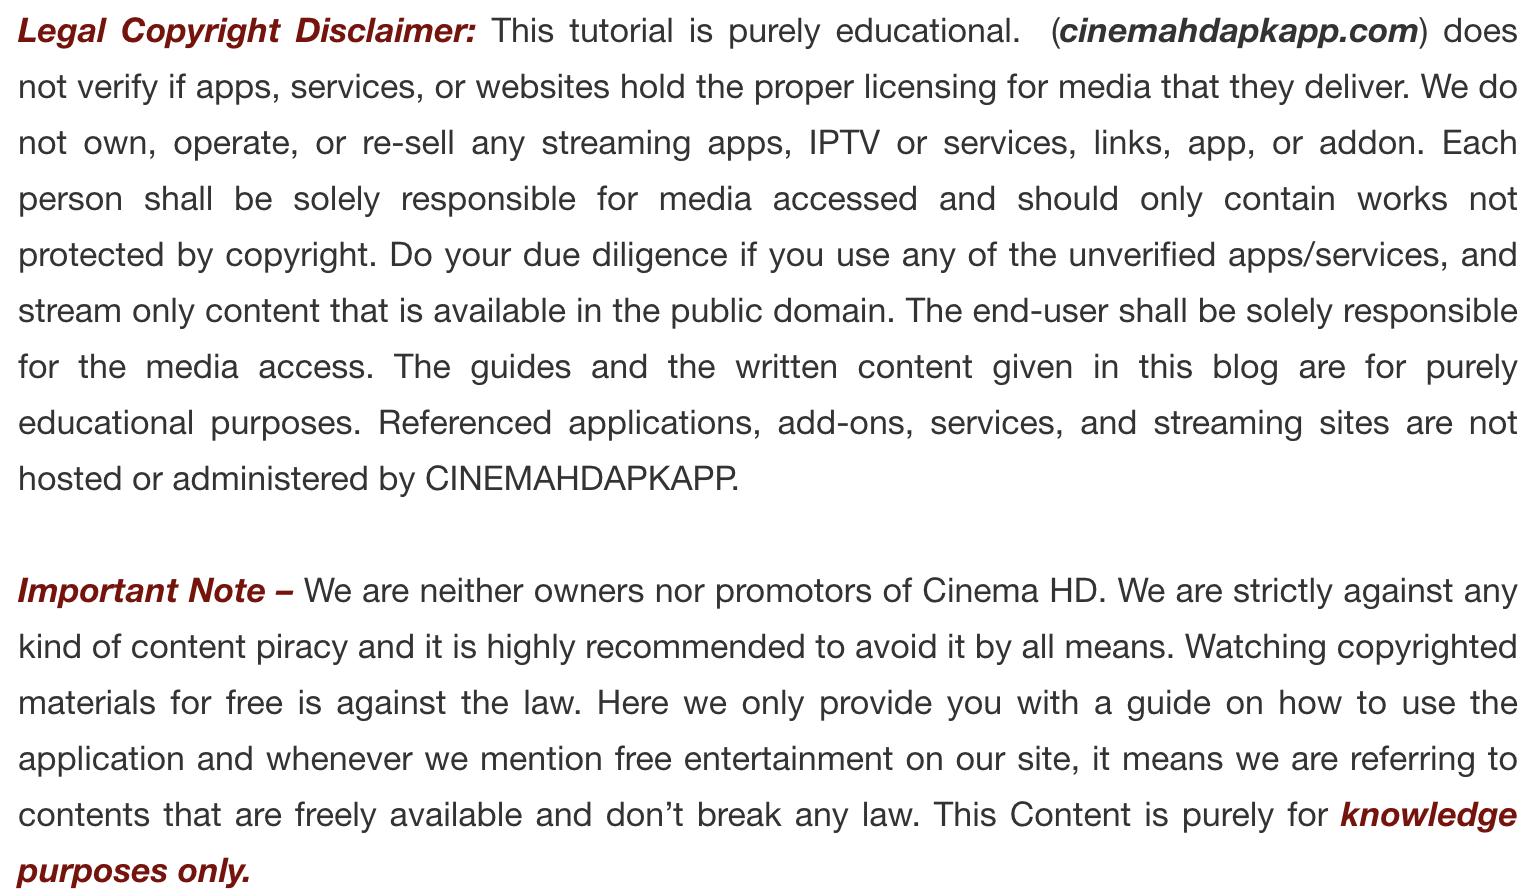 Legal Disclaimer - Cinema HD